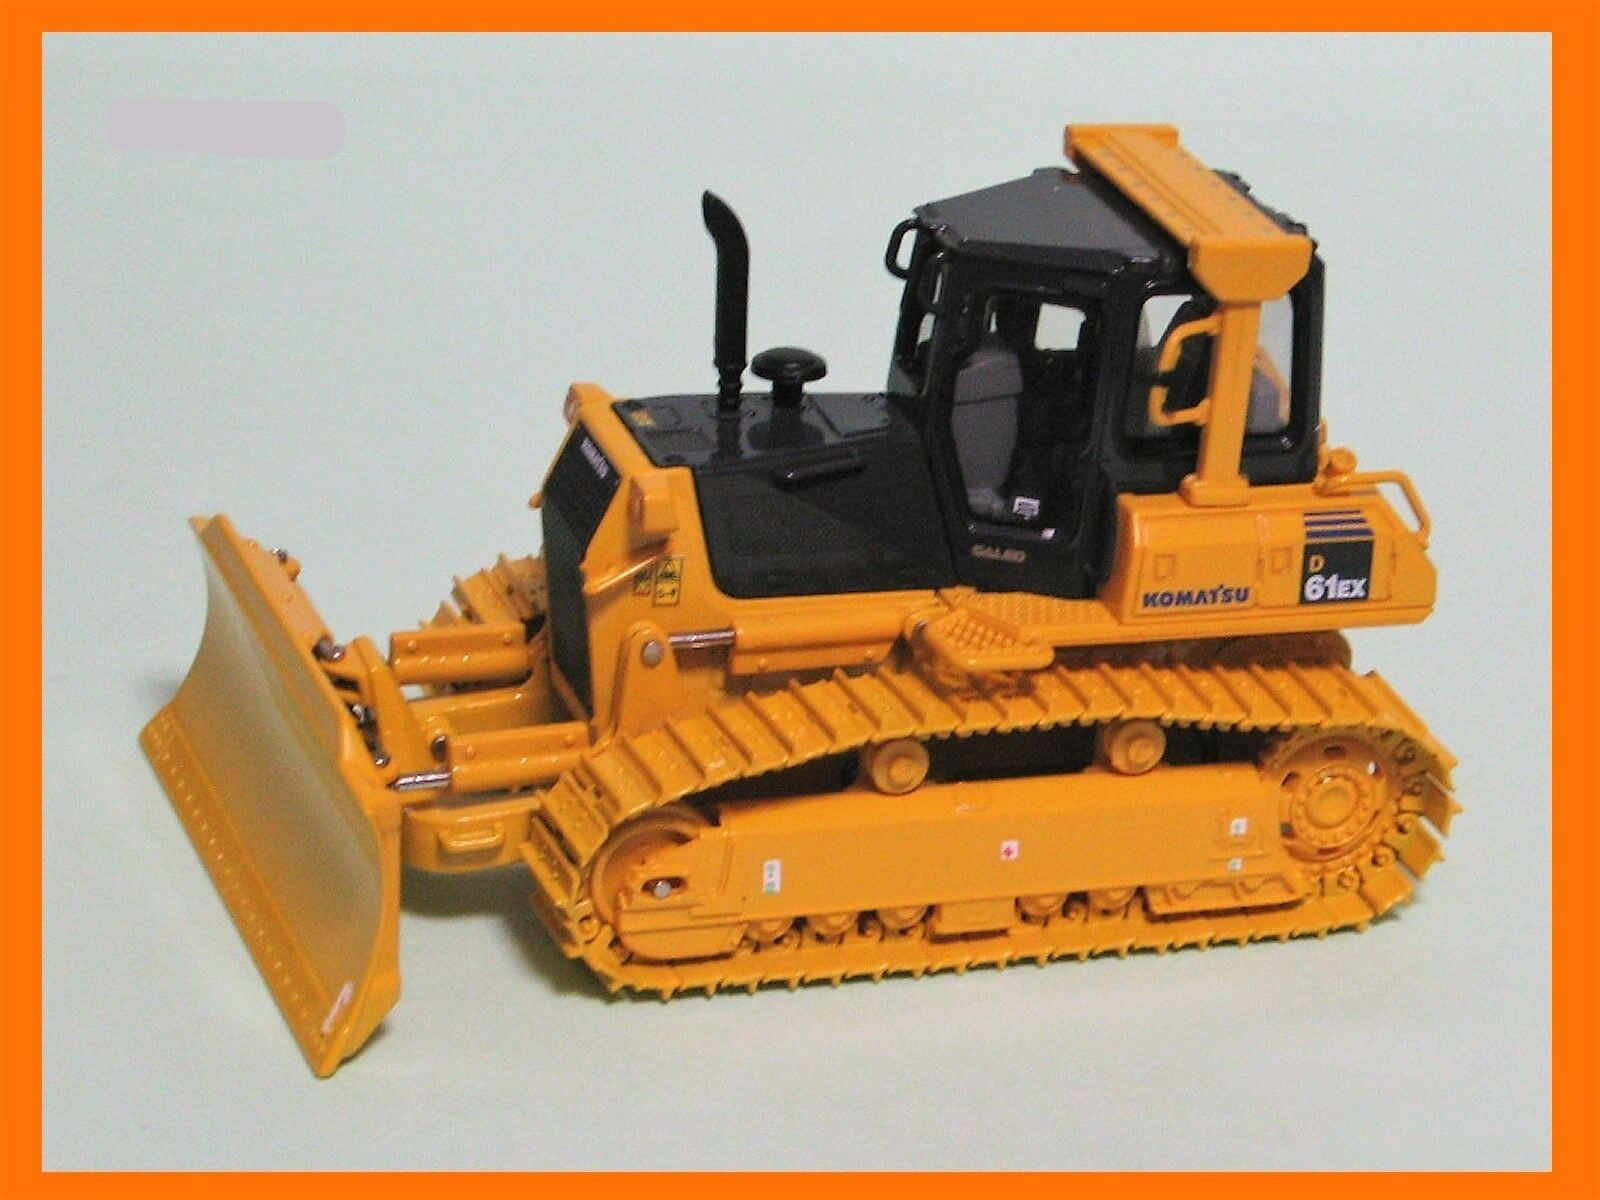 KOMATSU D61ex Bull Dozer - 1 50 scale by Universal Hobbies  8000U